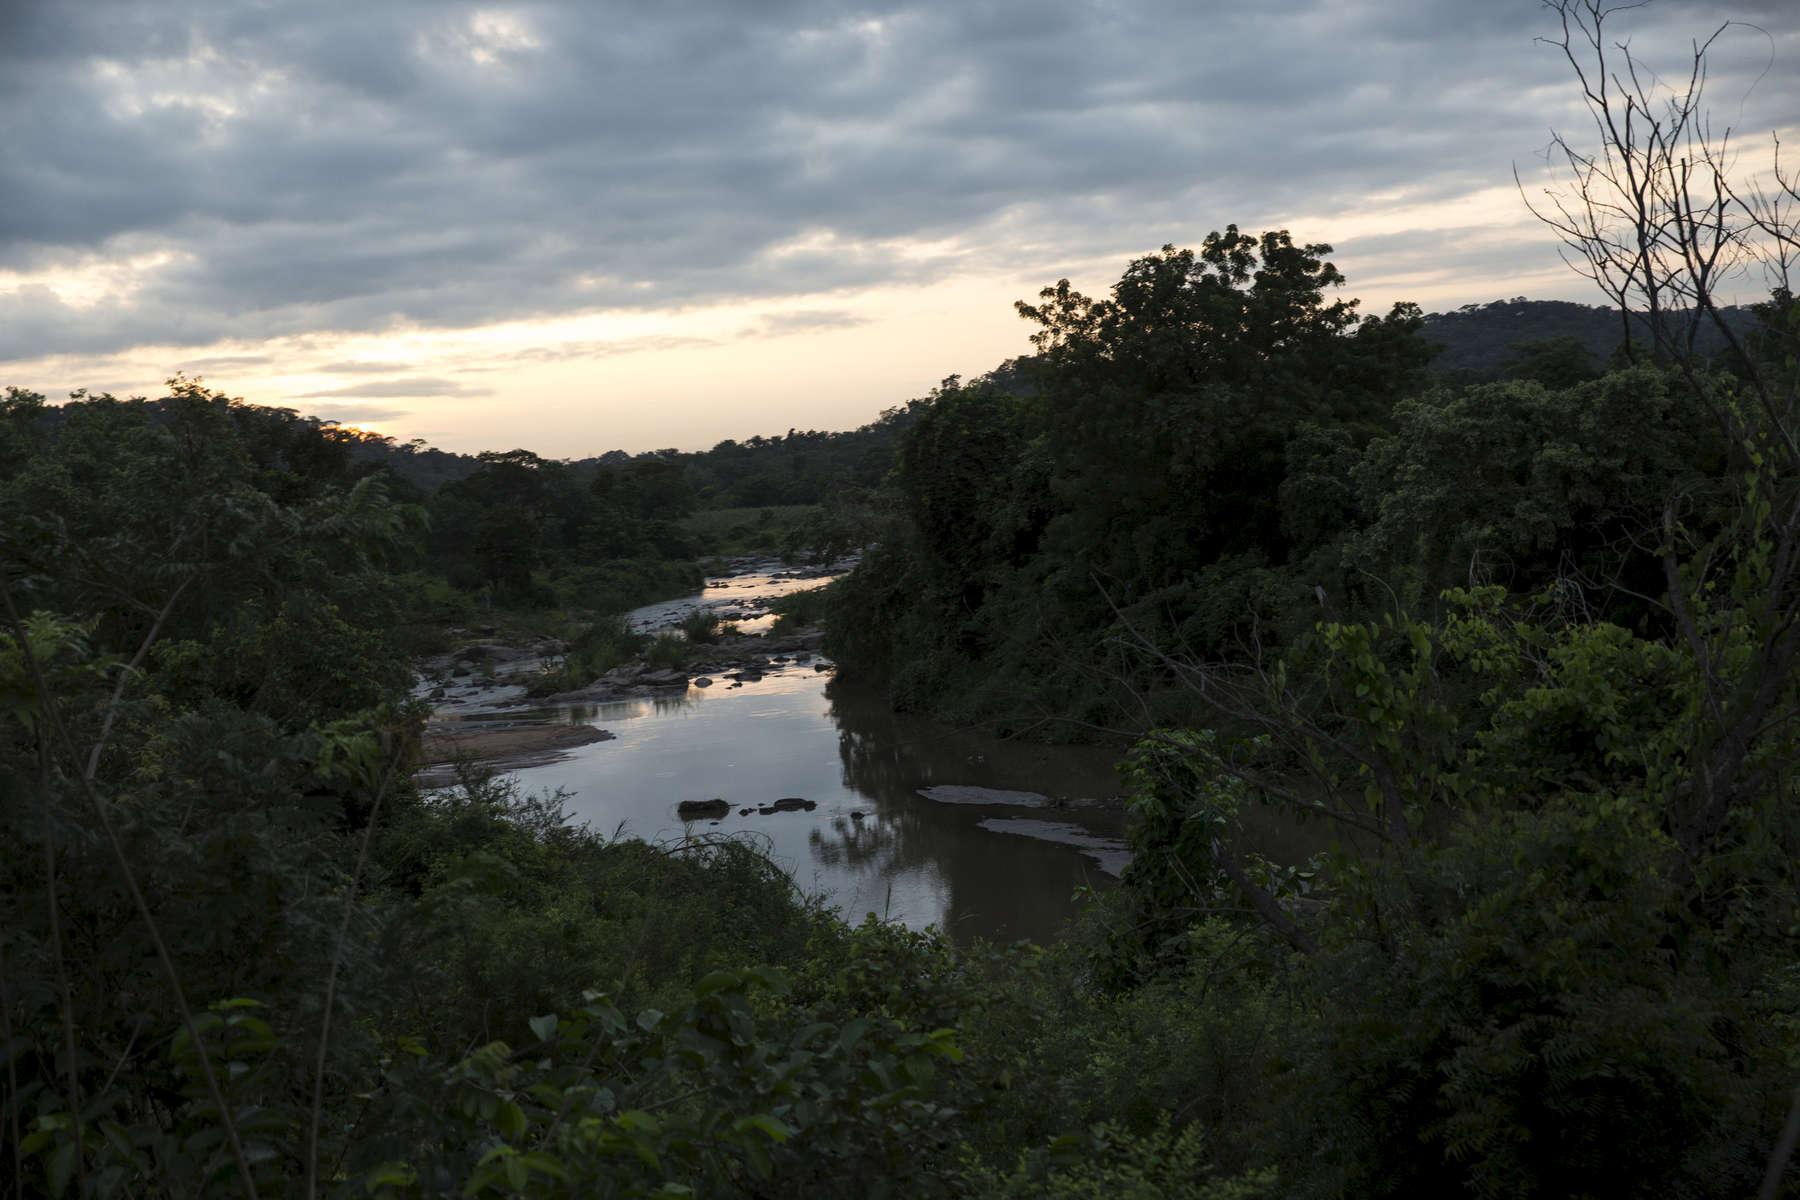 The train passes through central Nigeria around dawn.